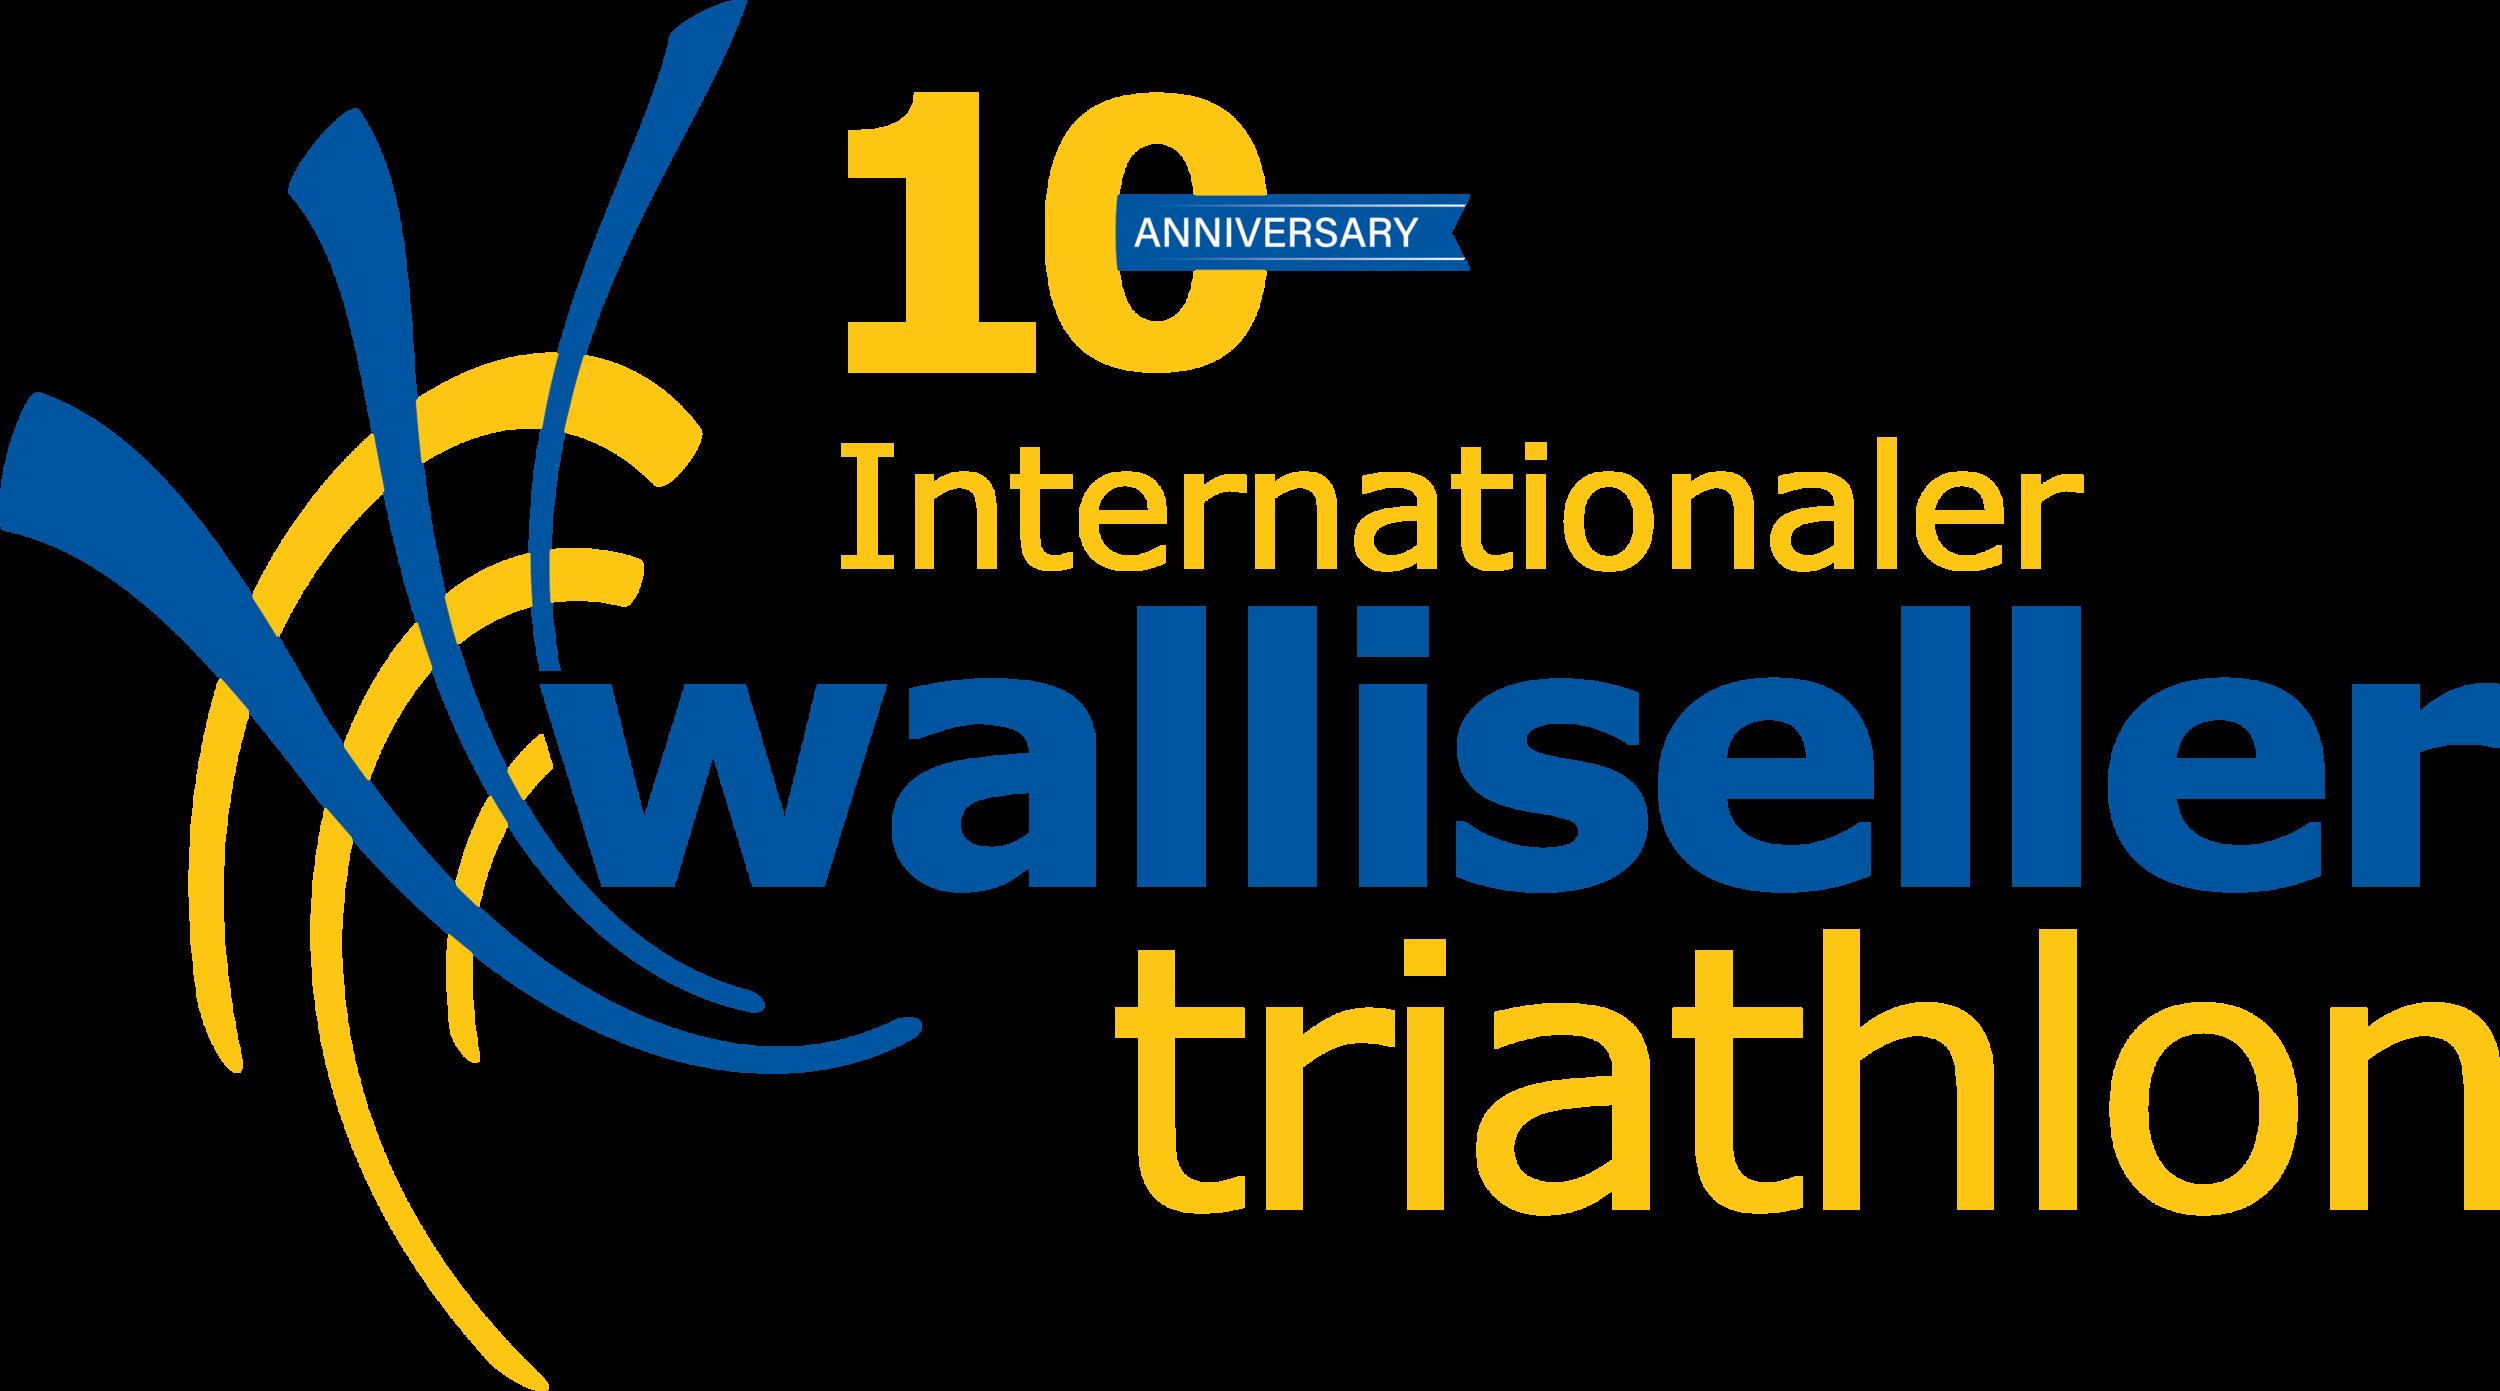 Internationaler-Walliseller-Triathlon_CMYK.png